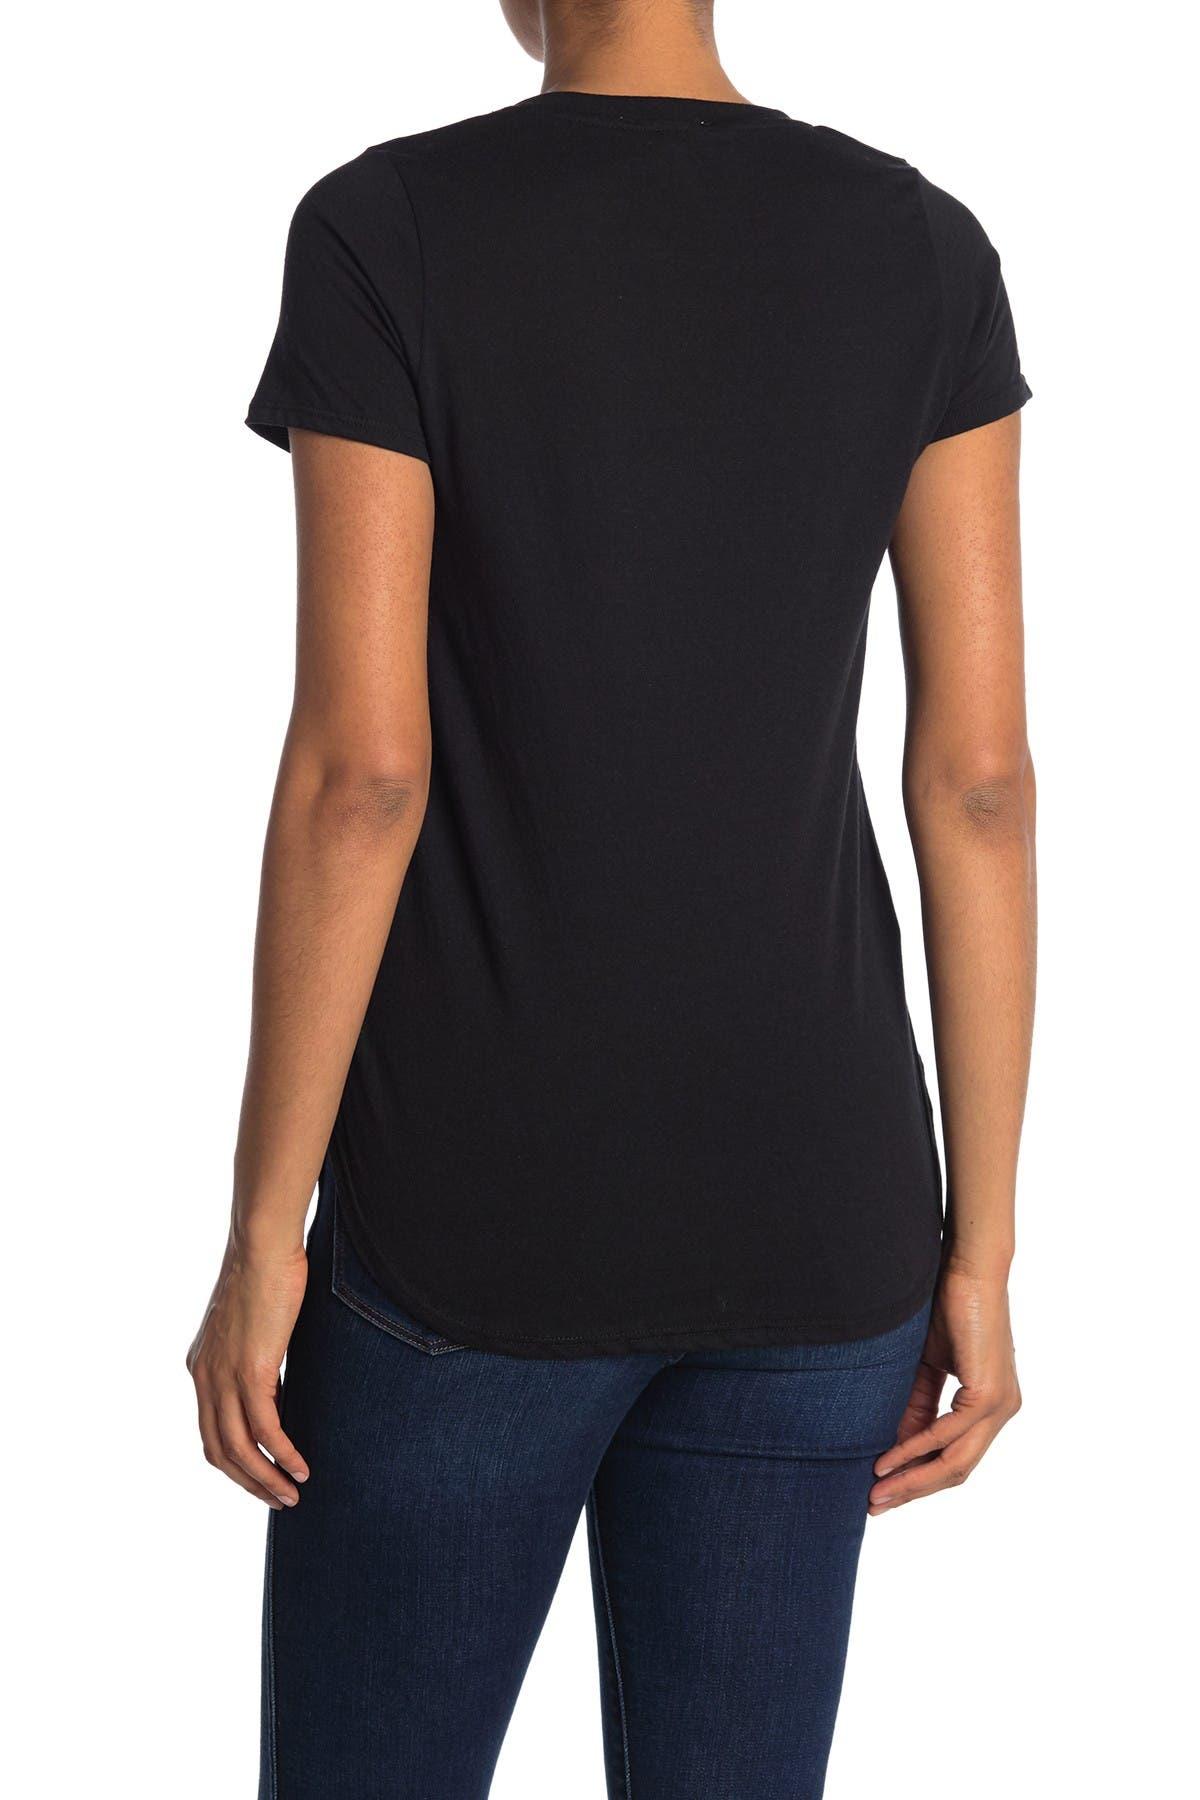 Image of We My People V-Neck Curved Hem Tunic T-Shirt